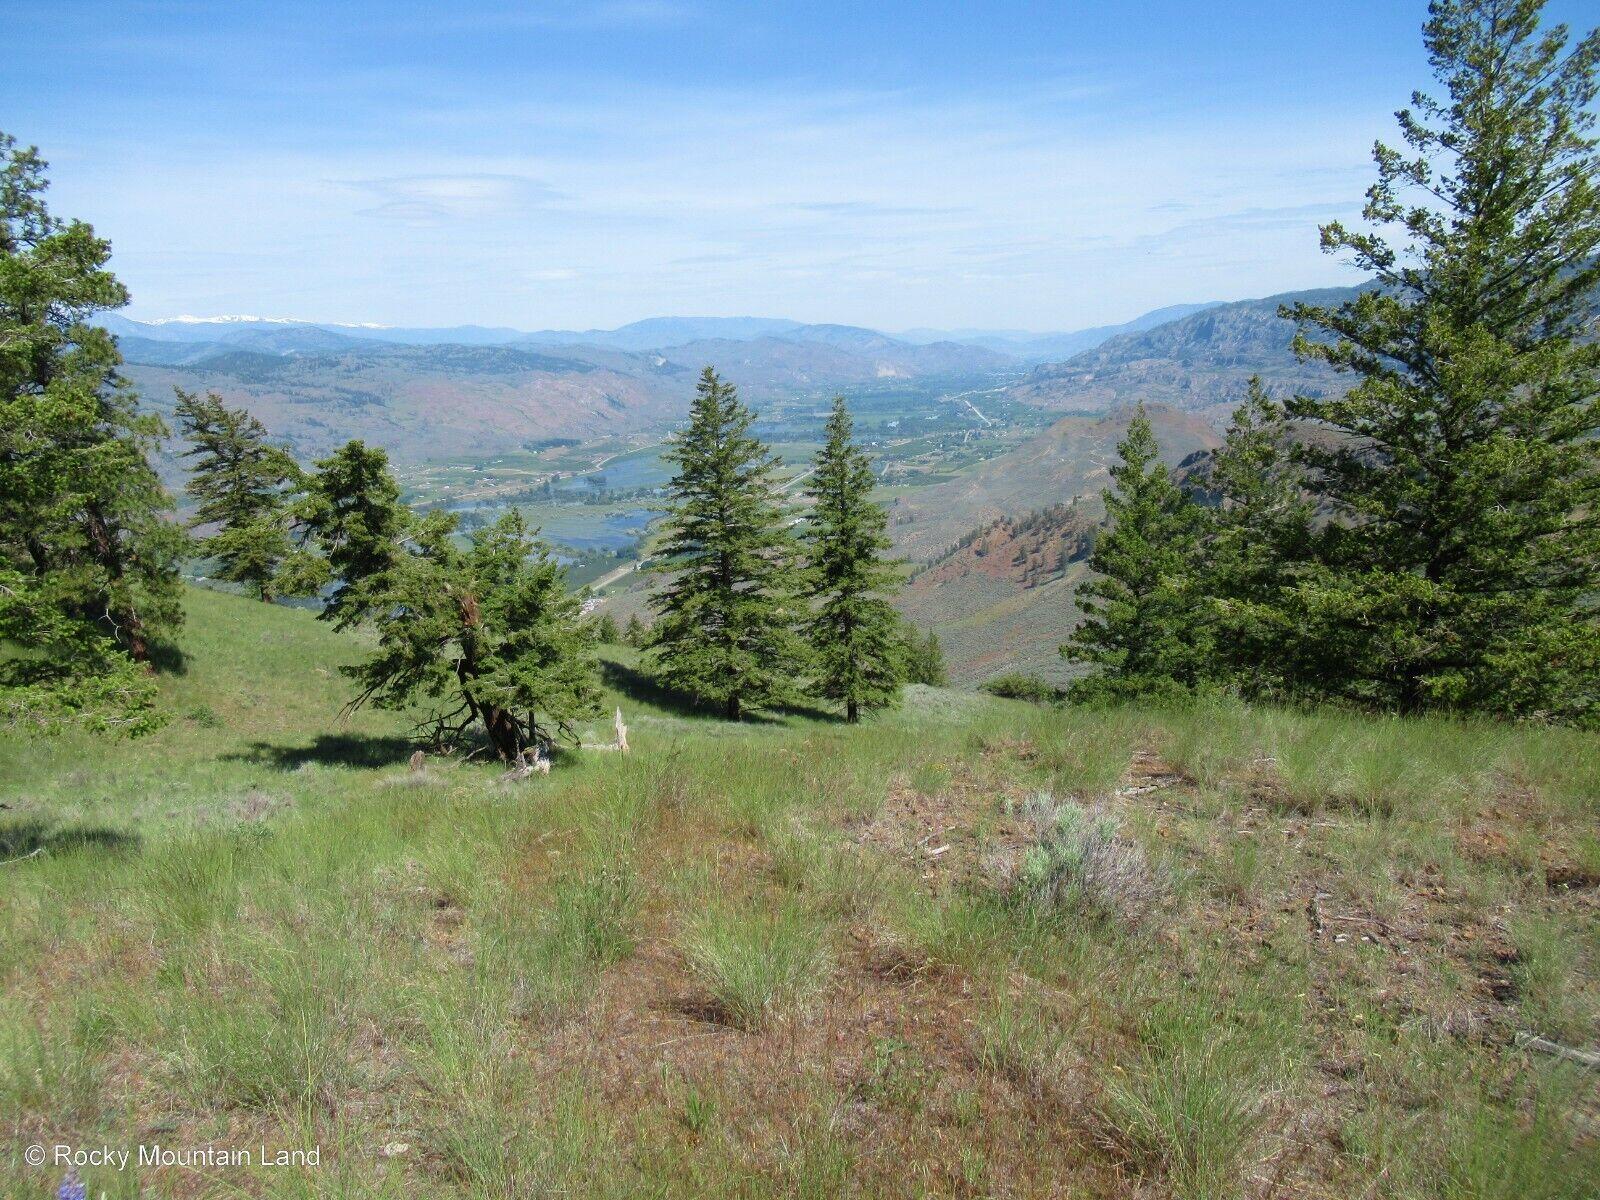 40.26 ACRES NORTHERN WASHINGTON PINE TREES, INCREDBILE RIVER VIEWS  - $4,050.00